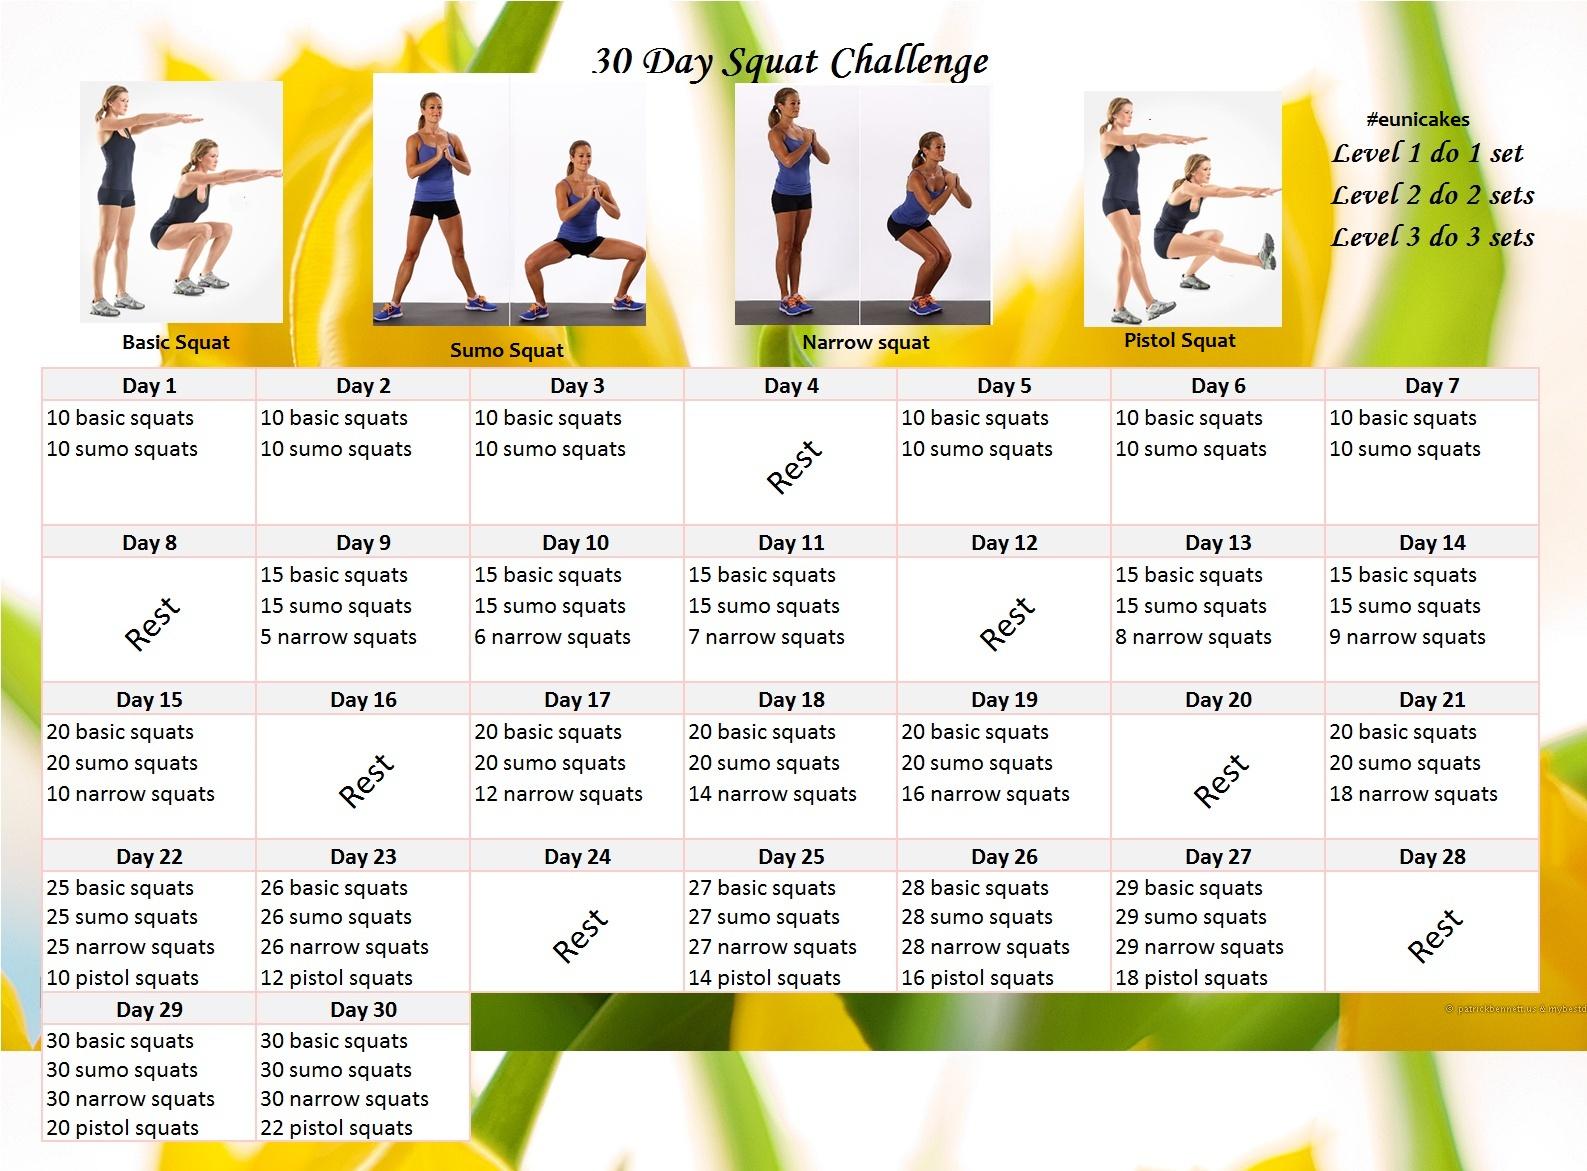 Fitness Challenge: 30 Day Squat Calendar Challenge   Eunicakes With 30 Day Squat Challenge Schedule Calendar